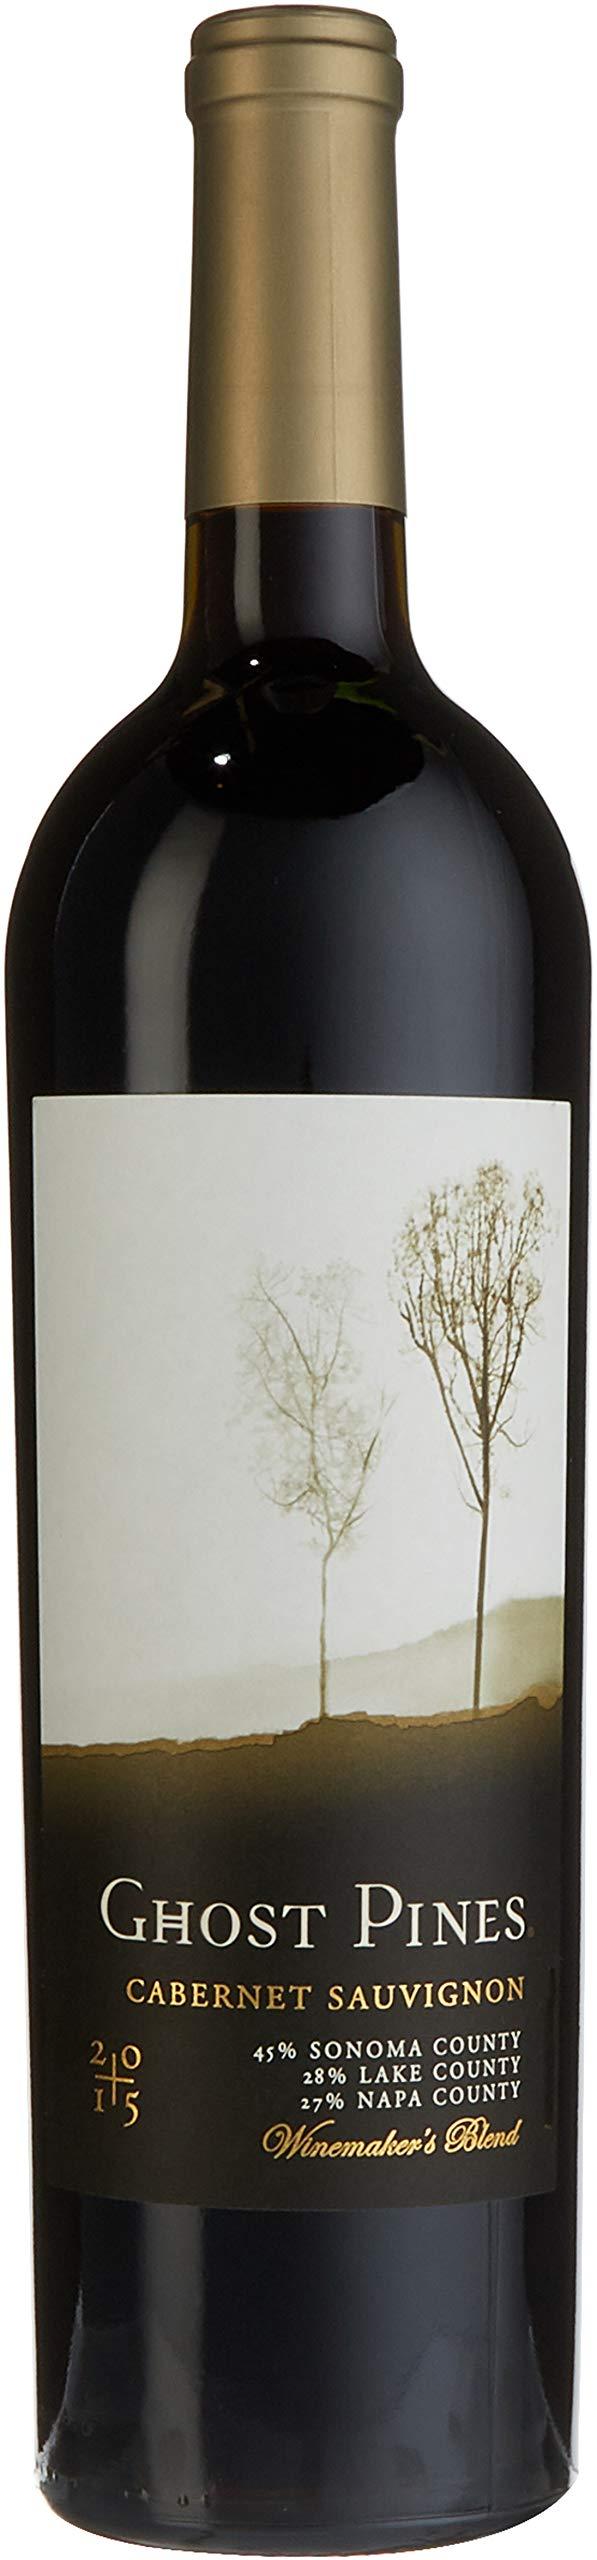 Ghost-Pines-by-Louis-M-Martini-Winery-Cabernet-Sauvignon-2012-Trocken-1-x-075-l